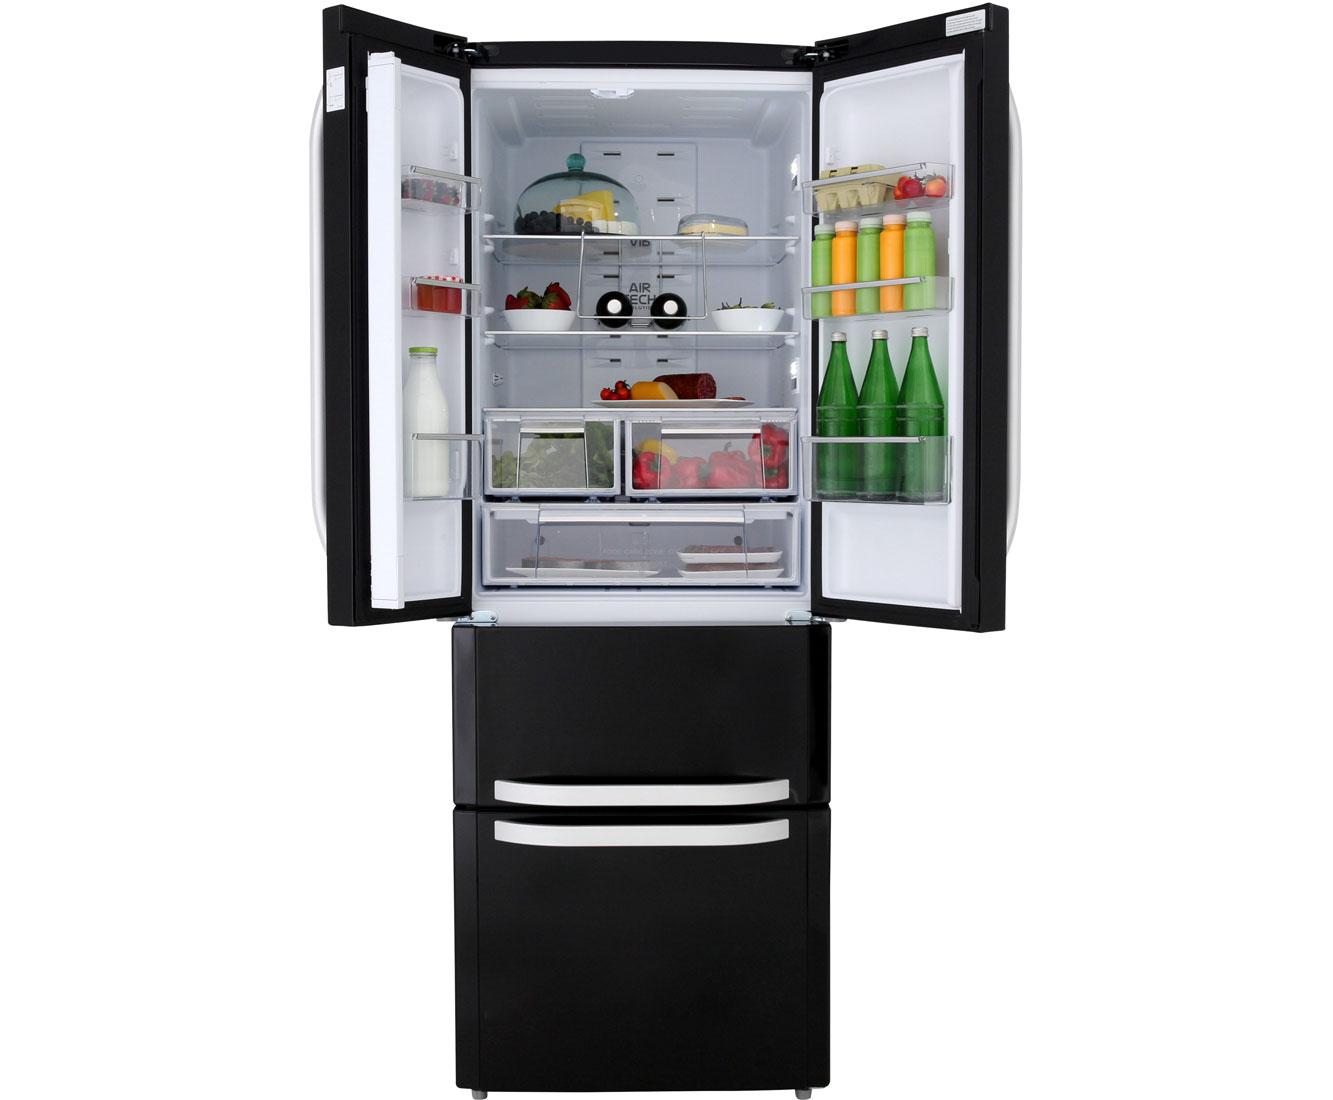 Side By Side Kühlschrank Breite 90 Cm : Side by side kühlschrank unter cm breit amerikanischer side by